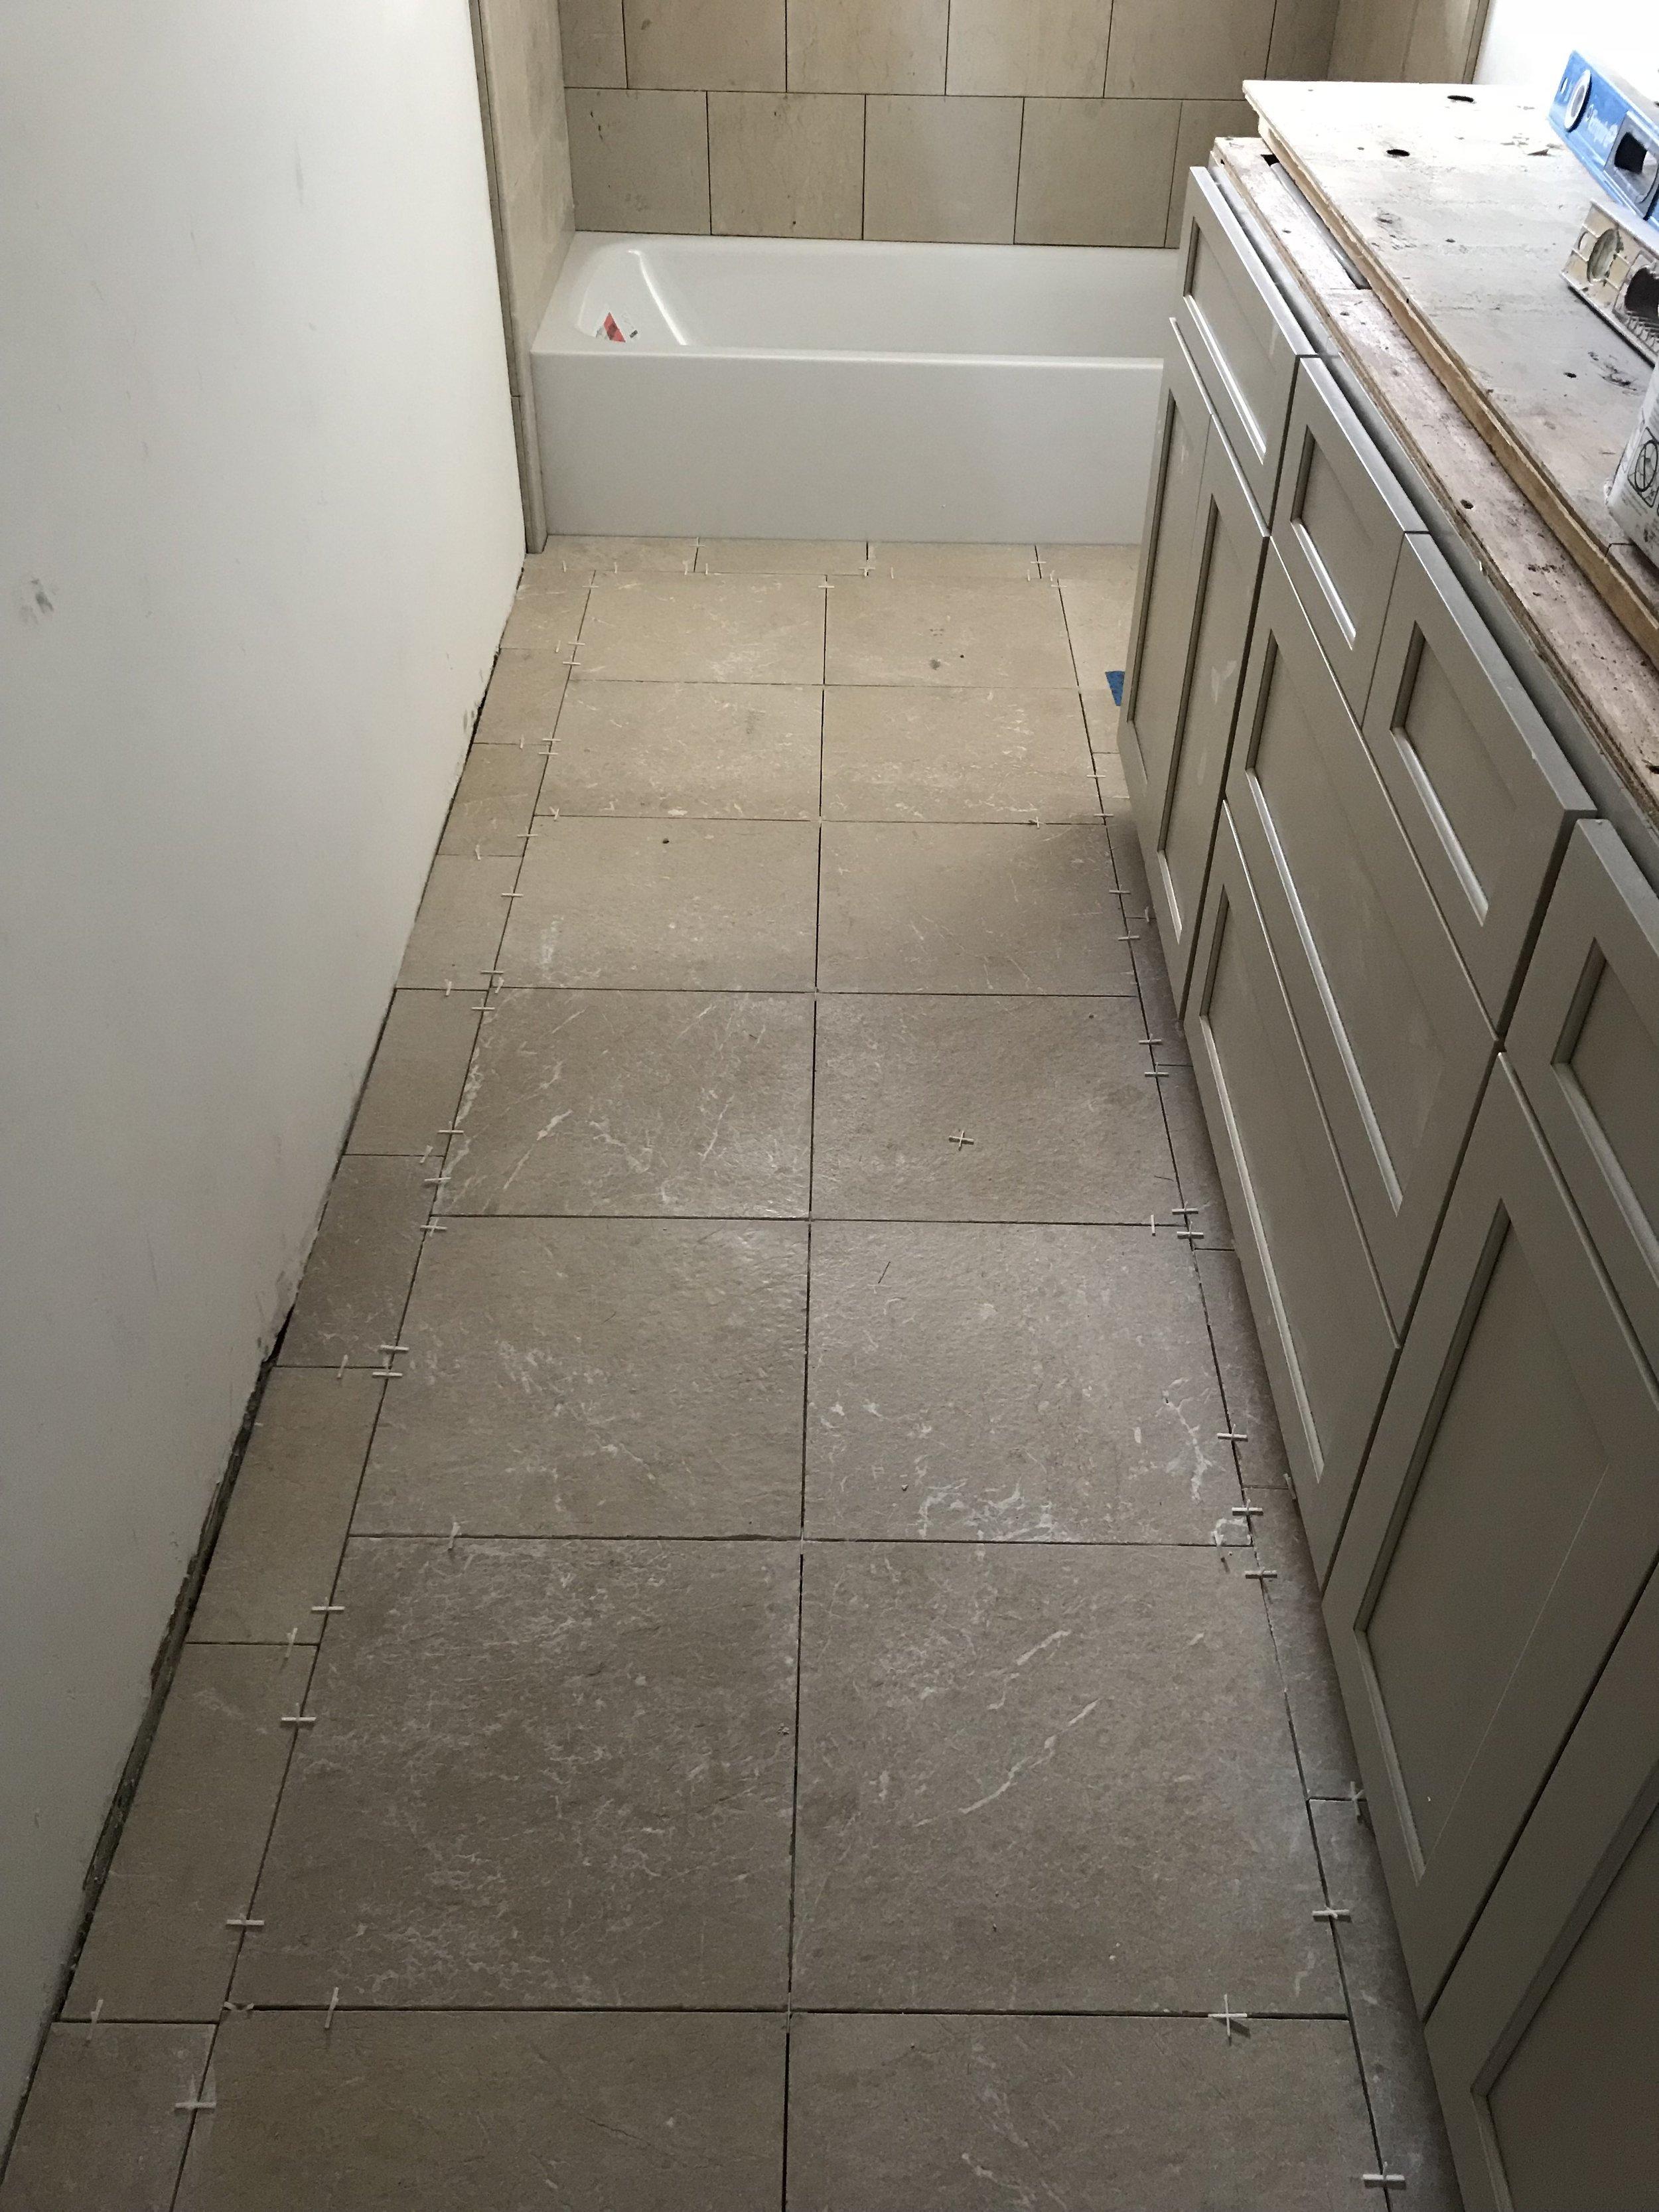 Complete Floor Tile Layout